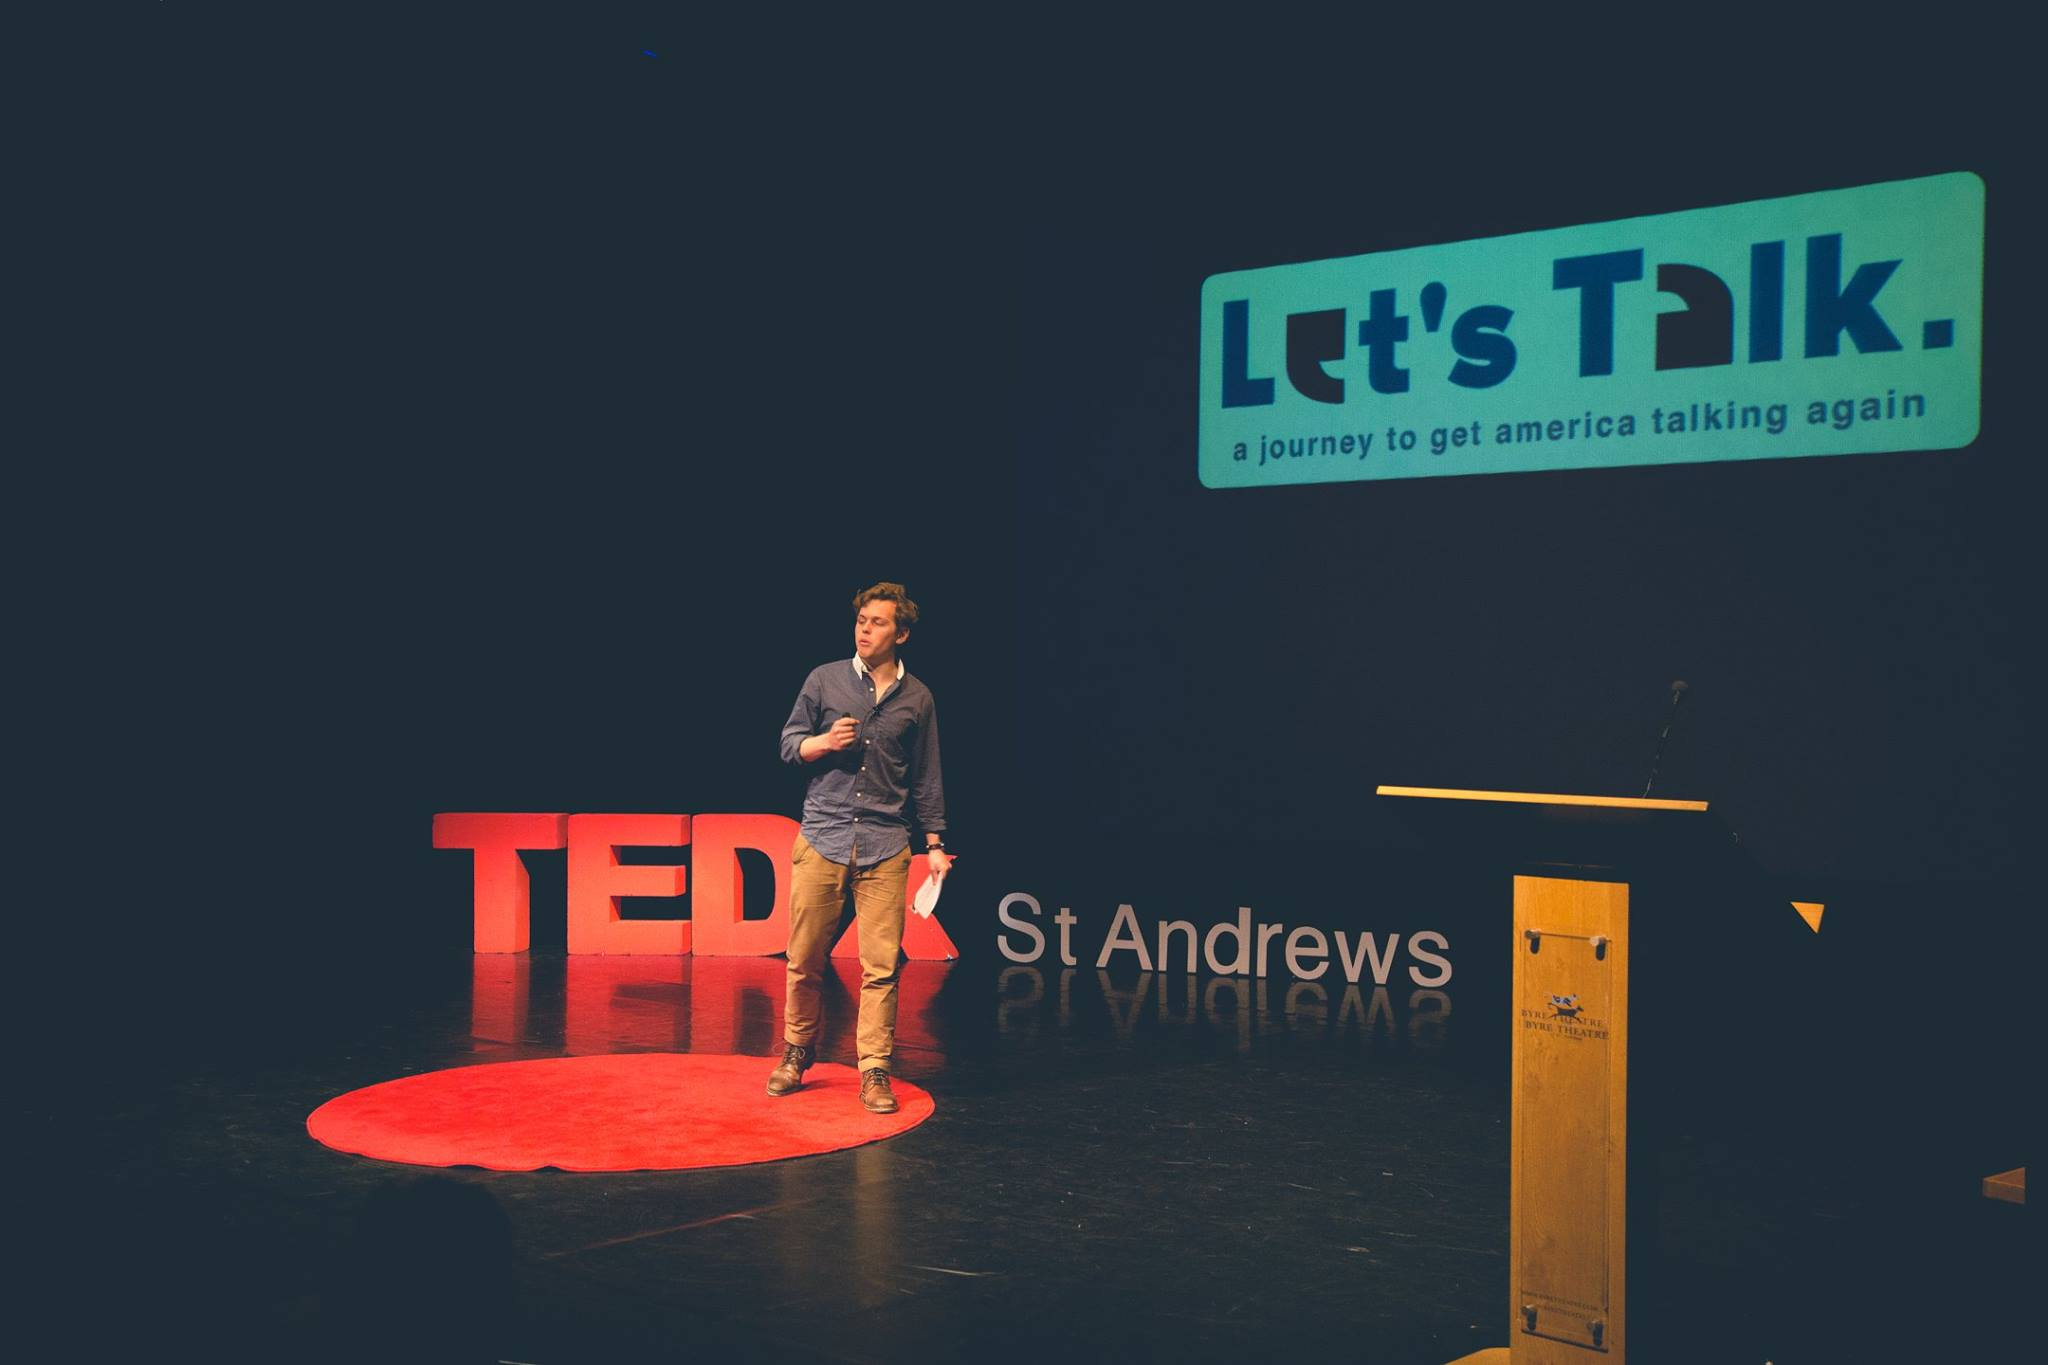 Photo From Tedx 4.jpg